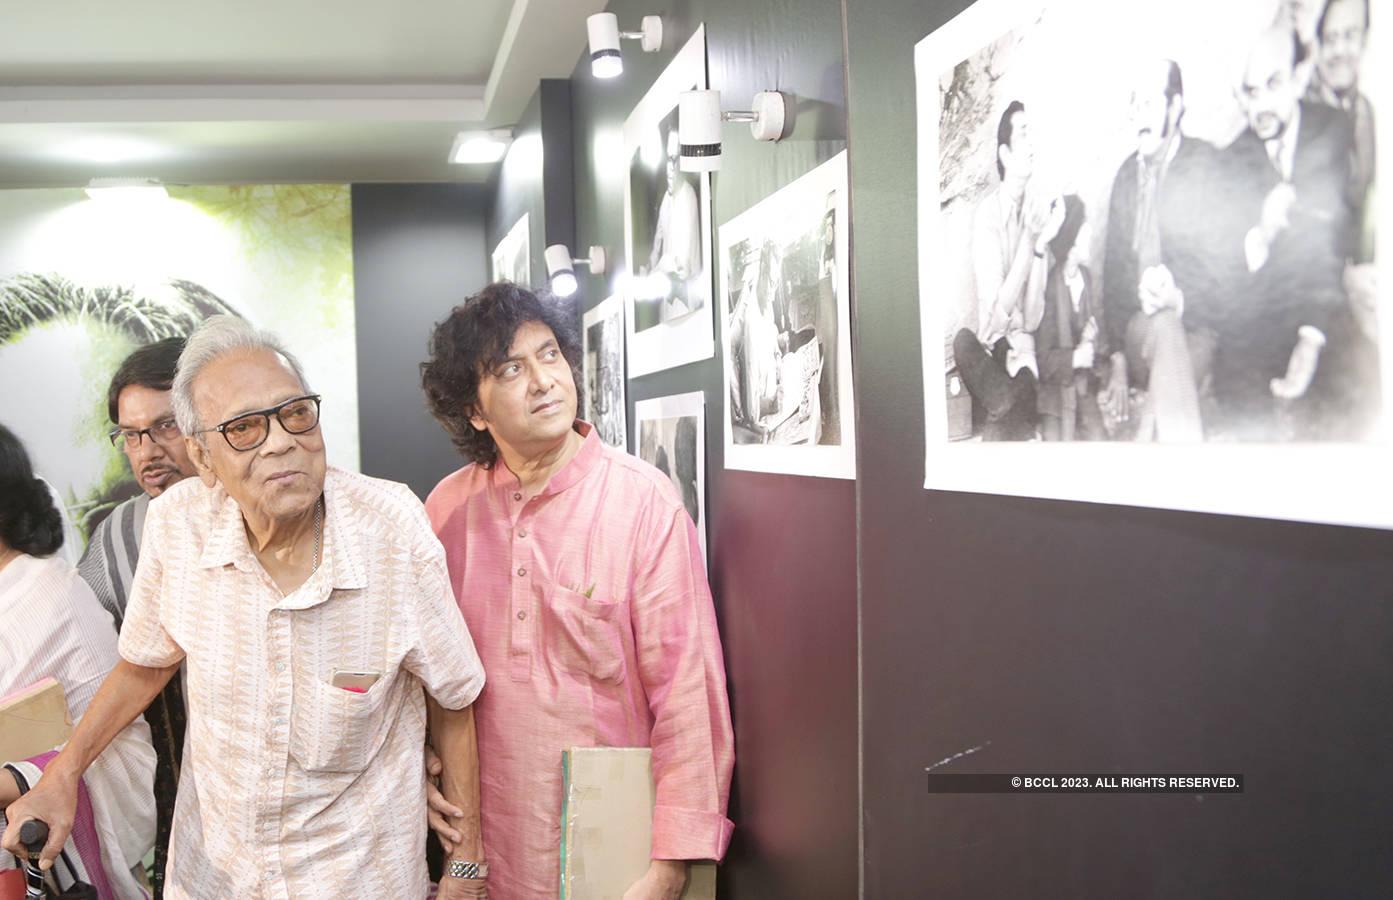 Nemai Ghosh's photography exhibition